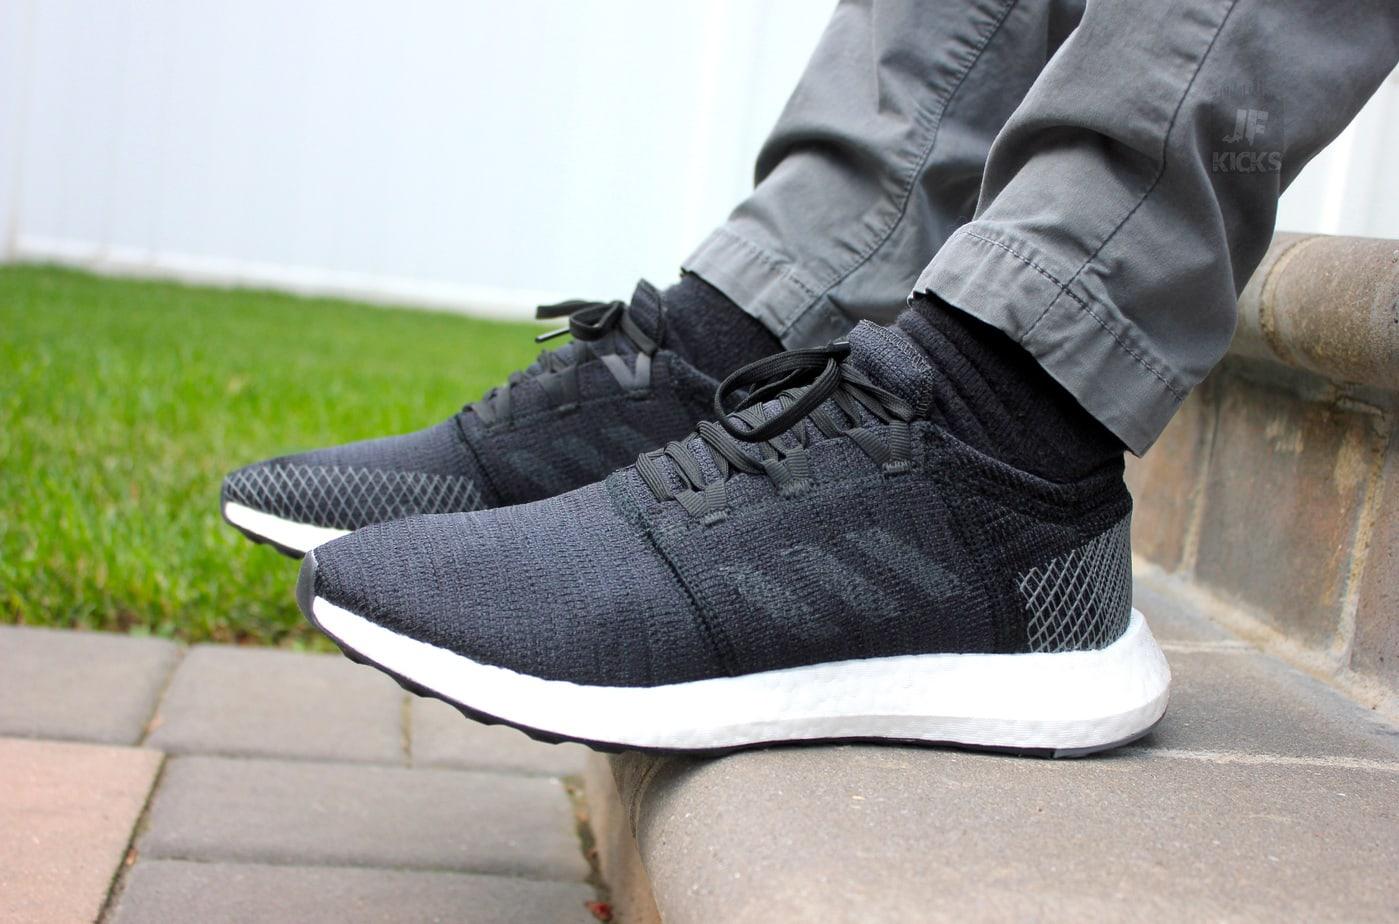 8a02fc882 adidas PureBoost Go On Foot Review - JustFreshKicks